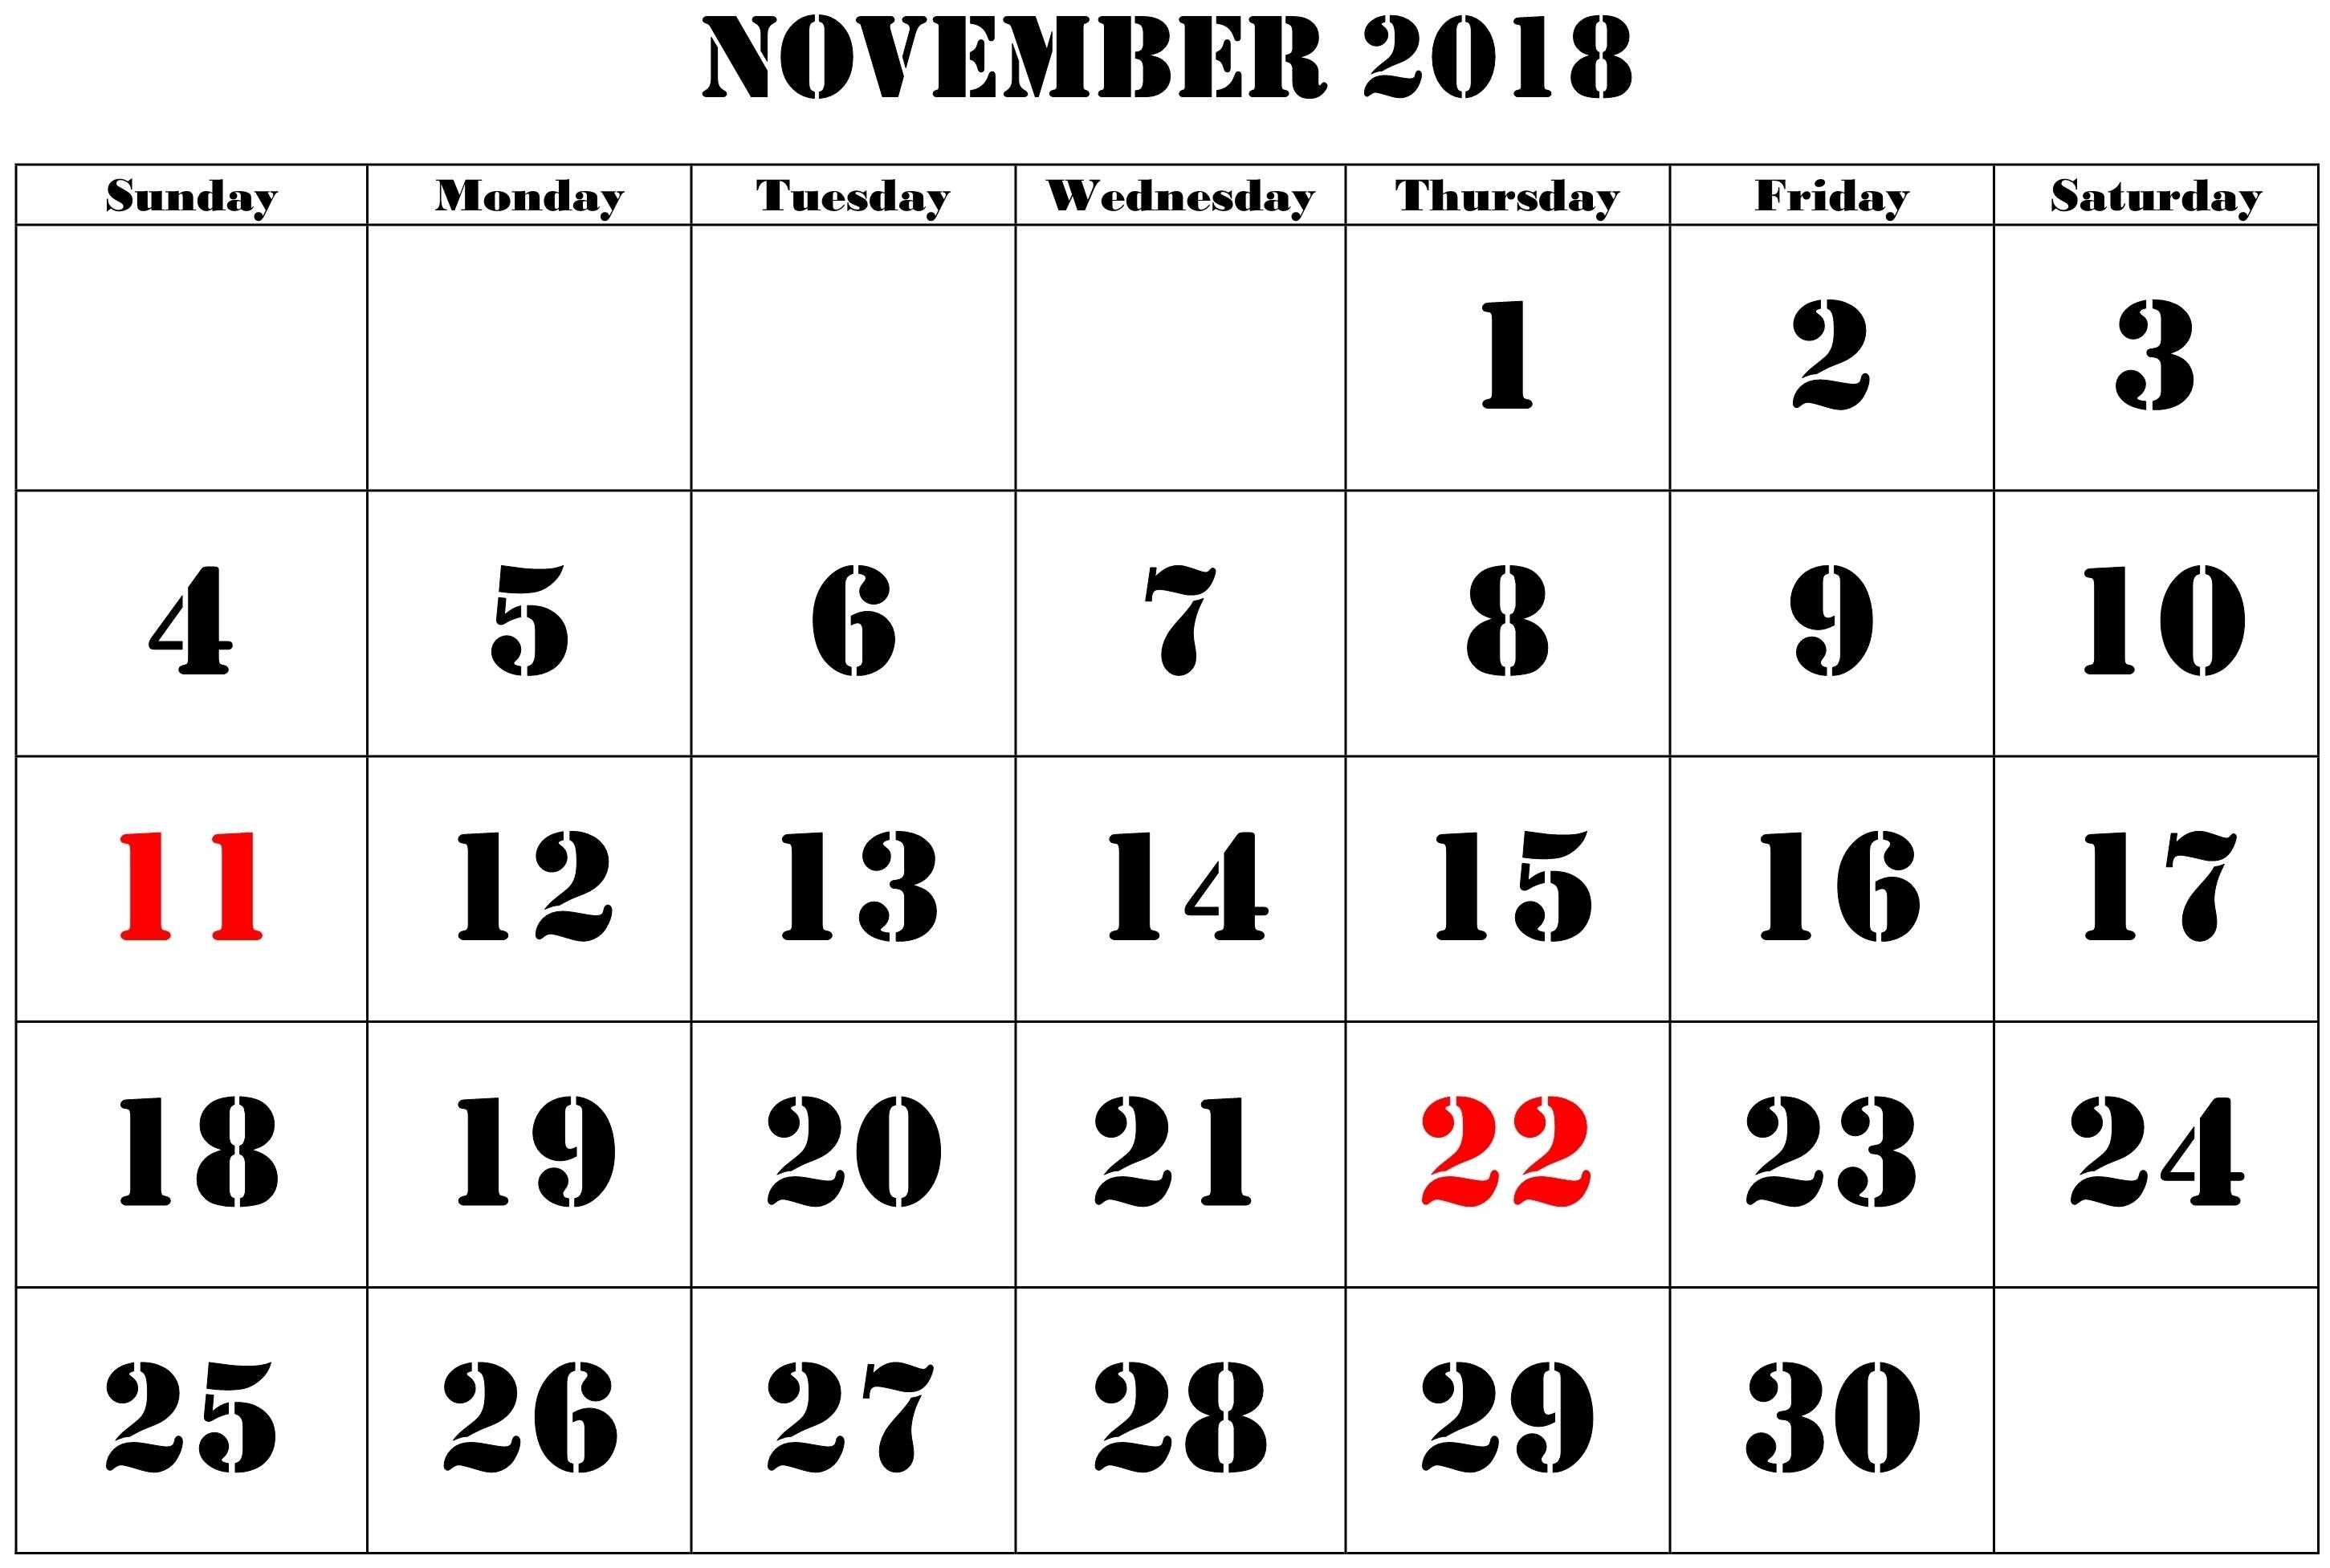 november 2018 calendar pdf printable 2 printable 2018 calendar::November 2018 Calendar Pdf